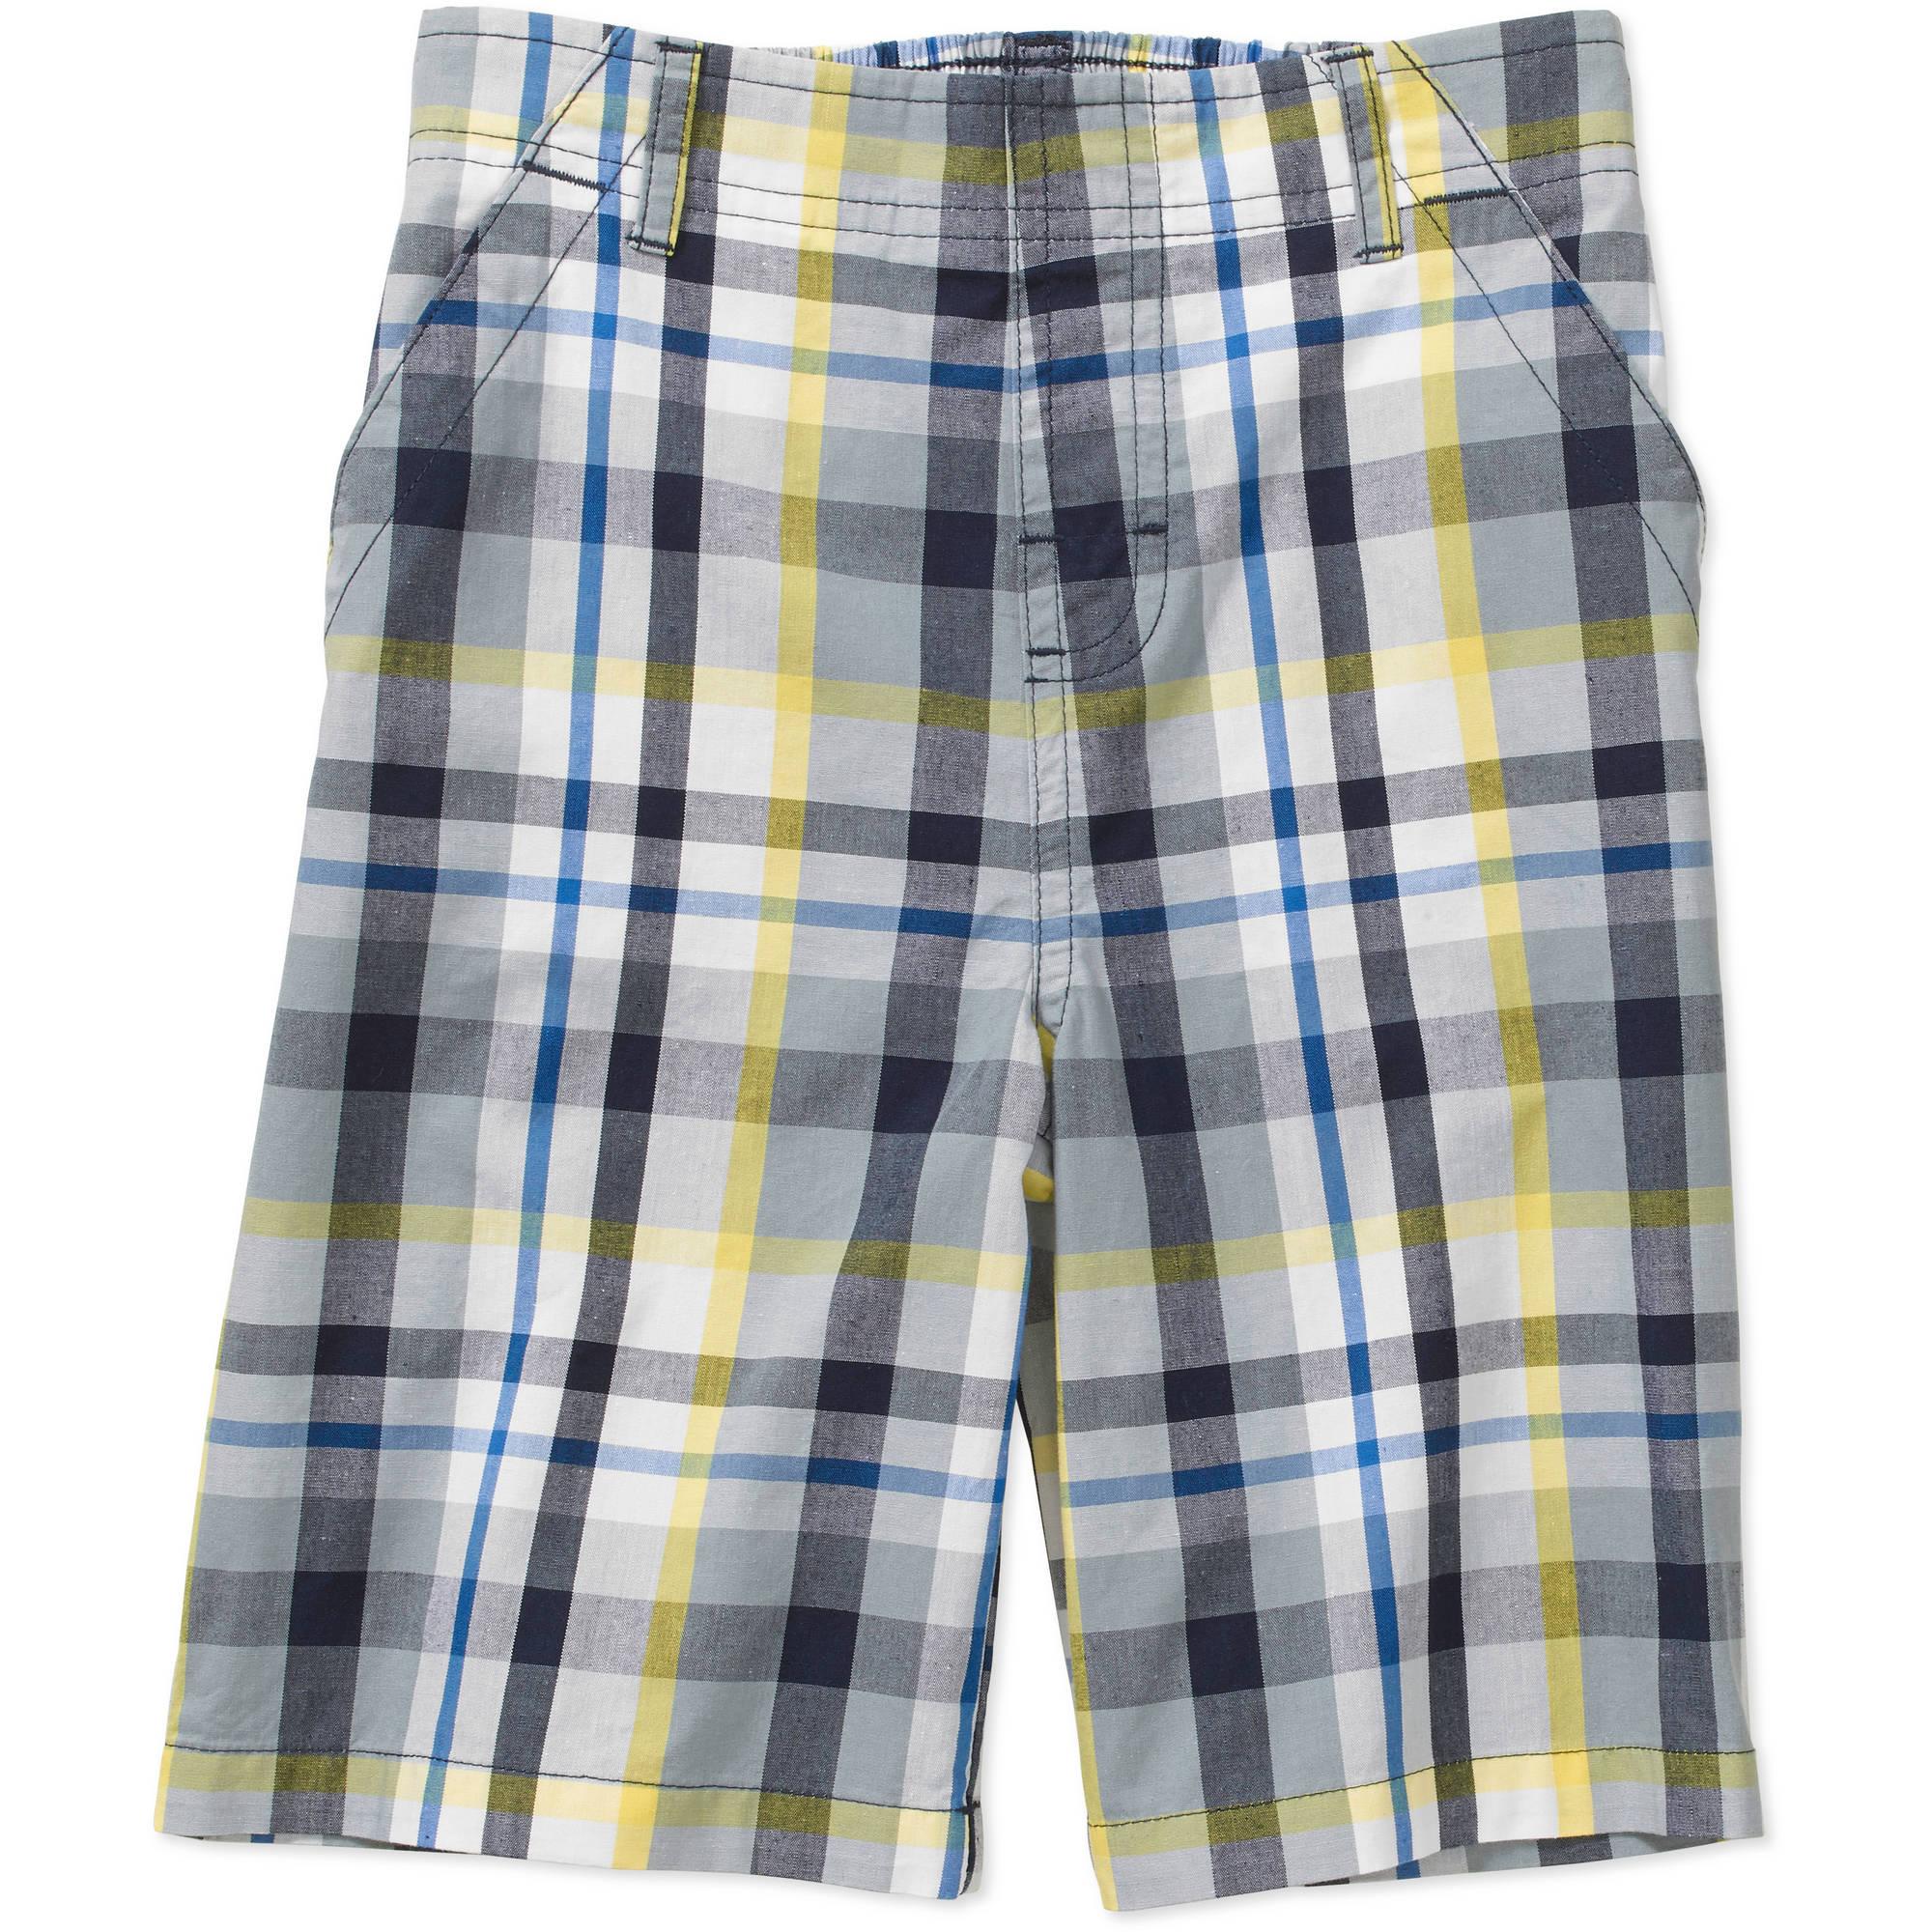 365 kids from garanimals boysu0027 woven plaid shorts with pockets - walmart.com LPGYLUU